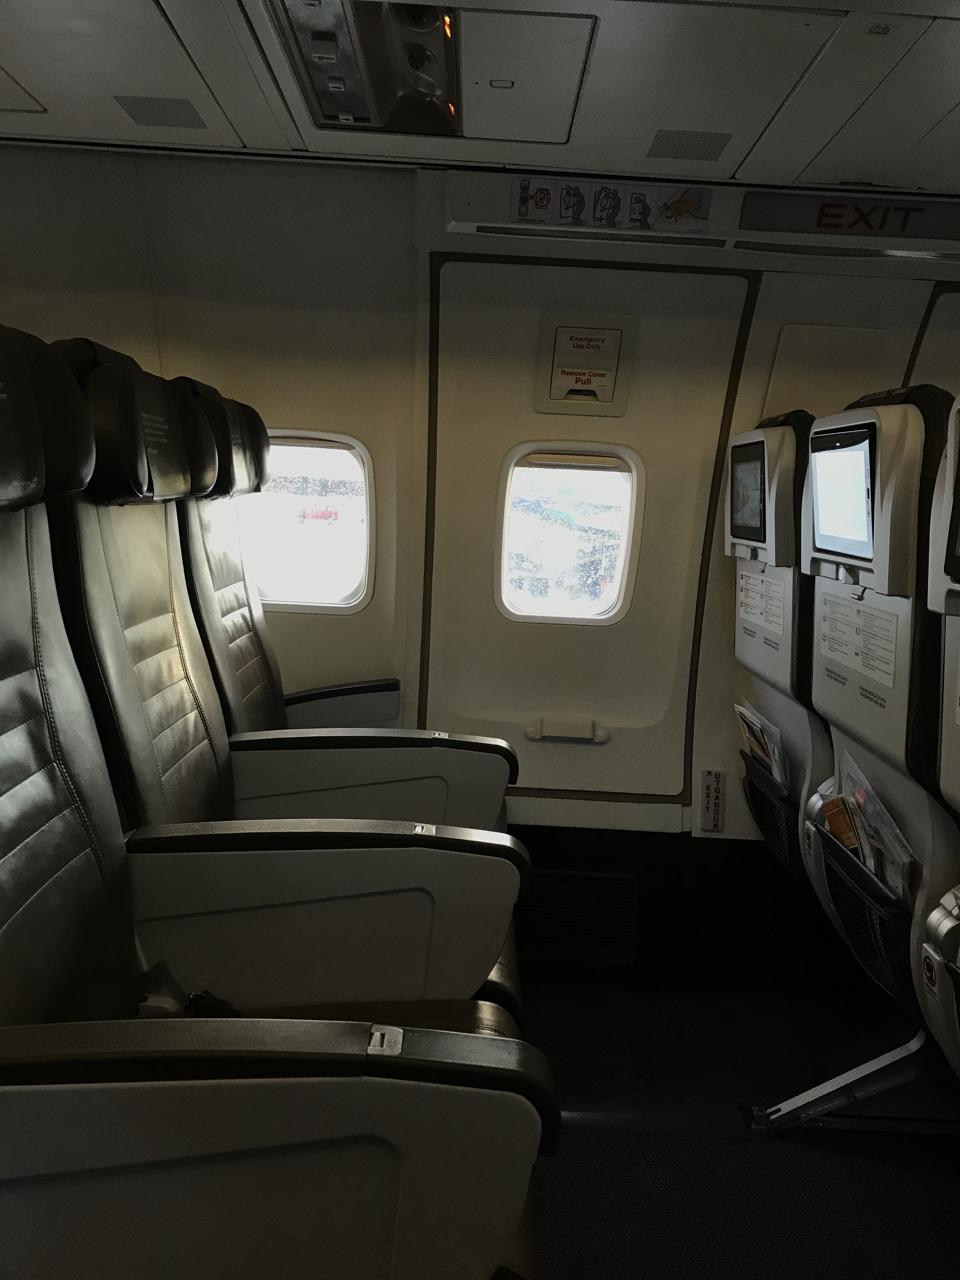 Icelandair Economy Class Kef Lhr B757 200 Palo Will Travel